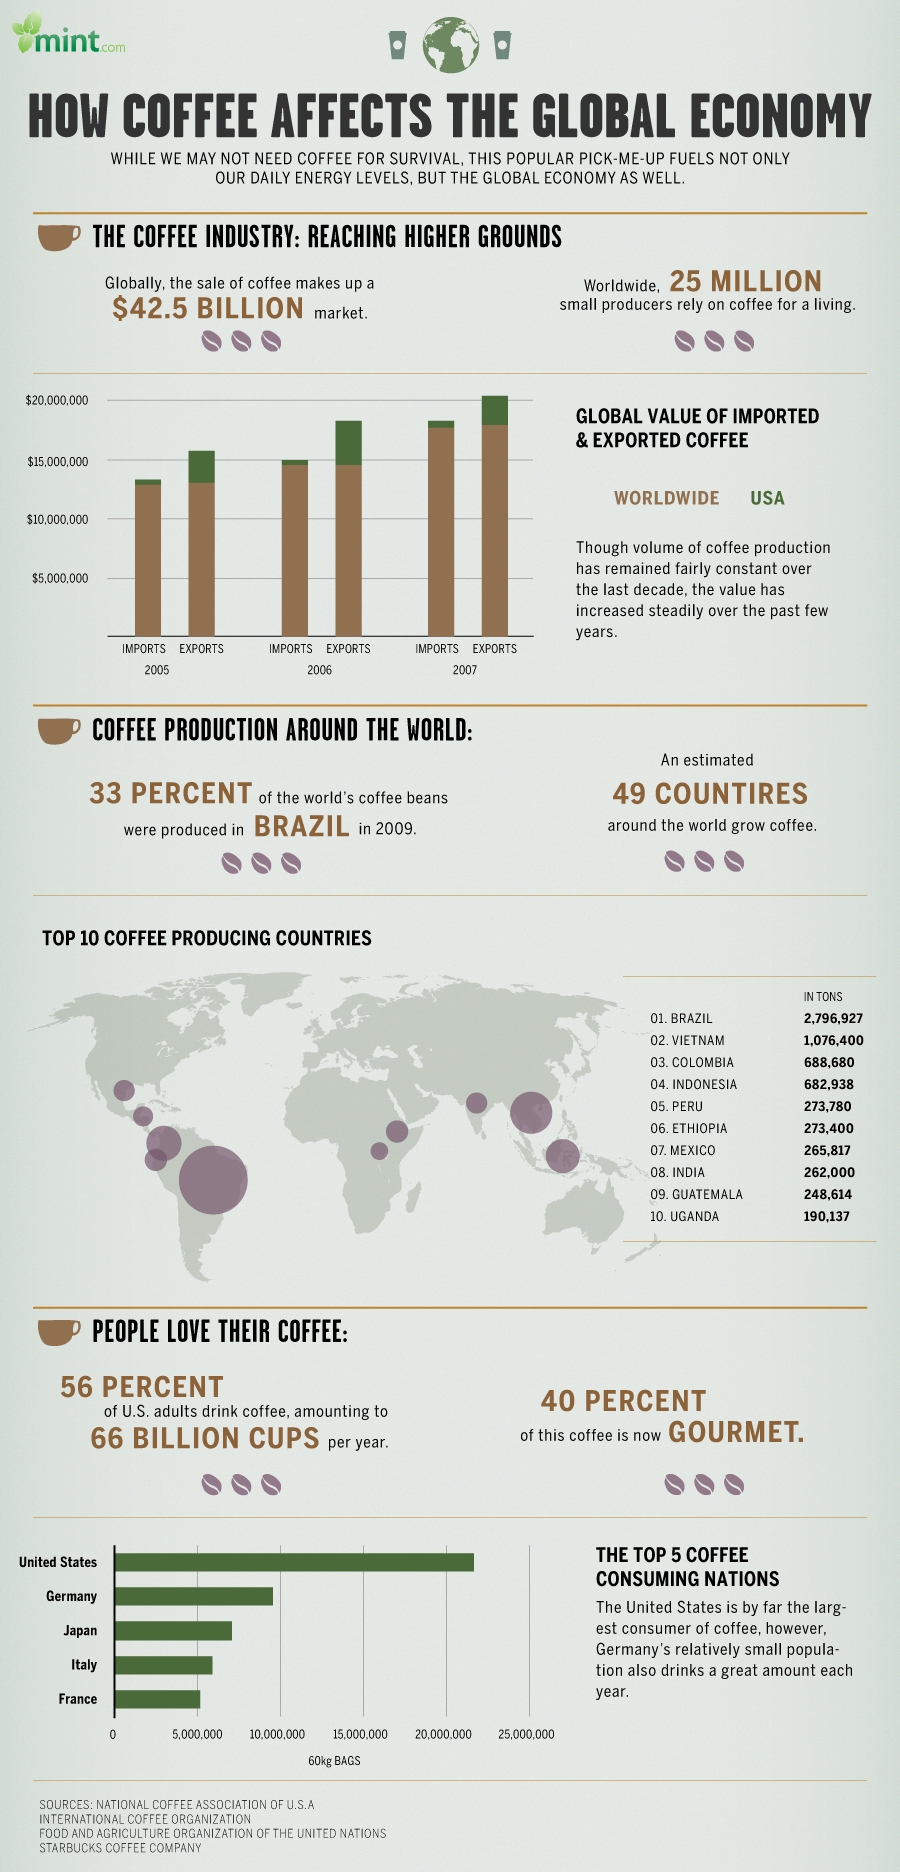 Mint.com-How-Coffee-Affects-the-Global-Economy.jpg